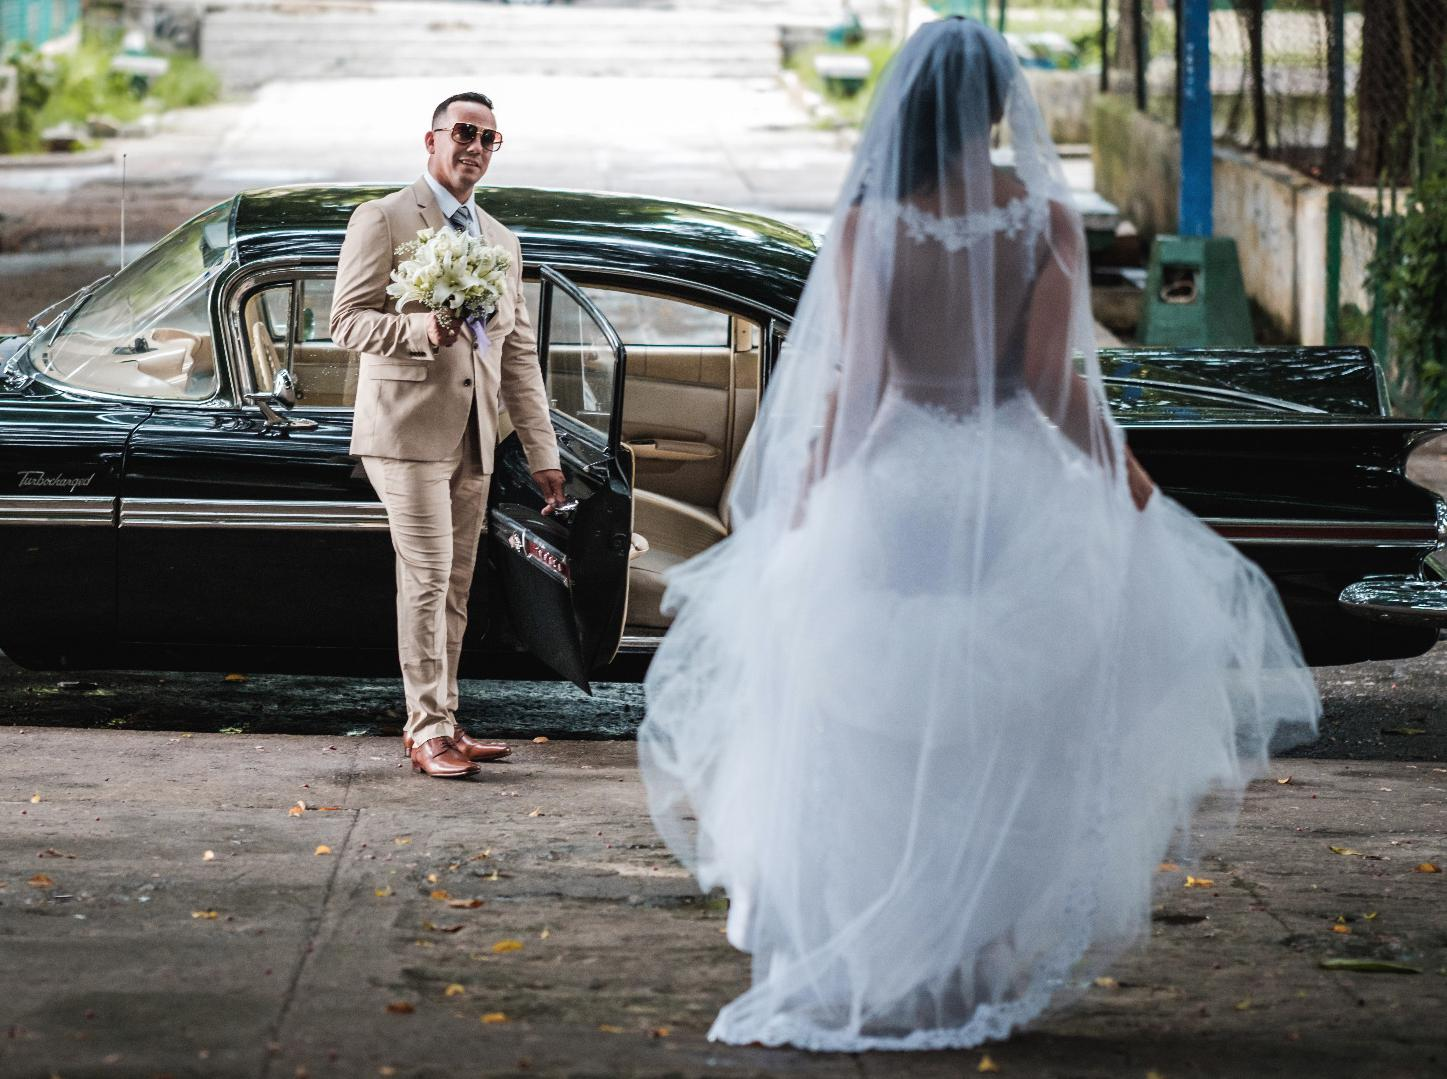 bodas-sin-clasificar-sin-tema-cuba-35401.jpg